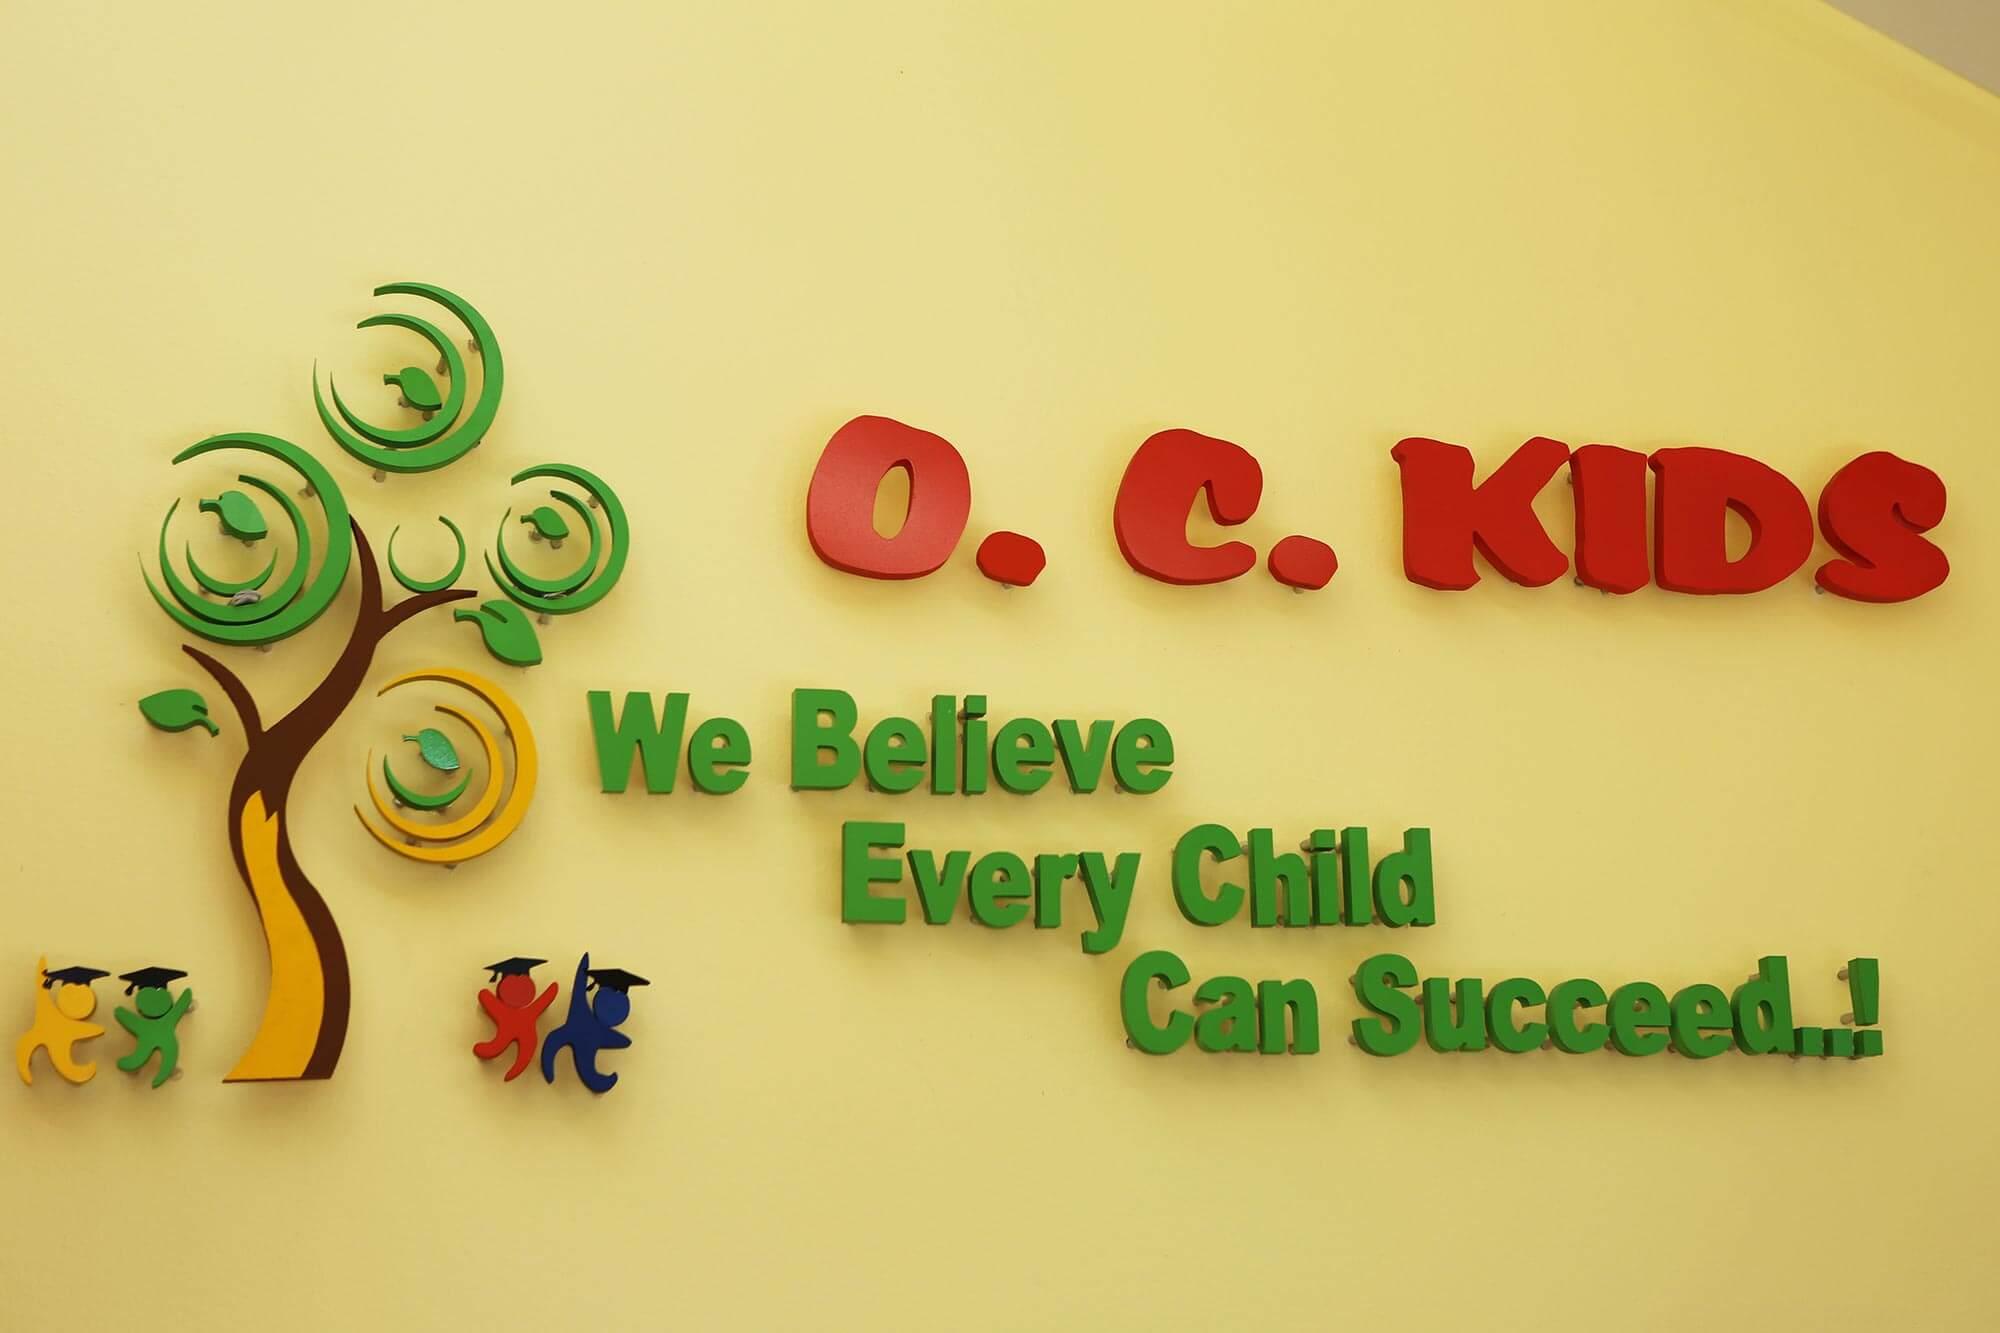 oc kids preschool